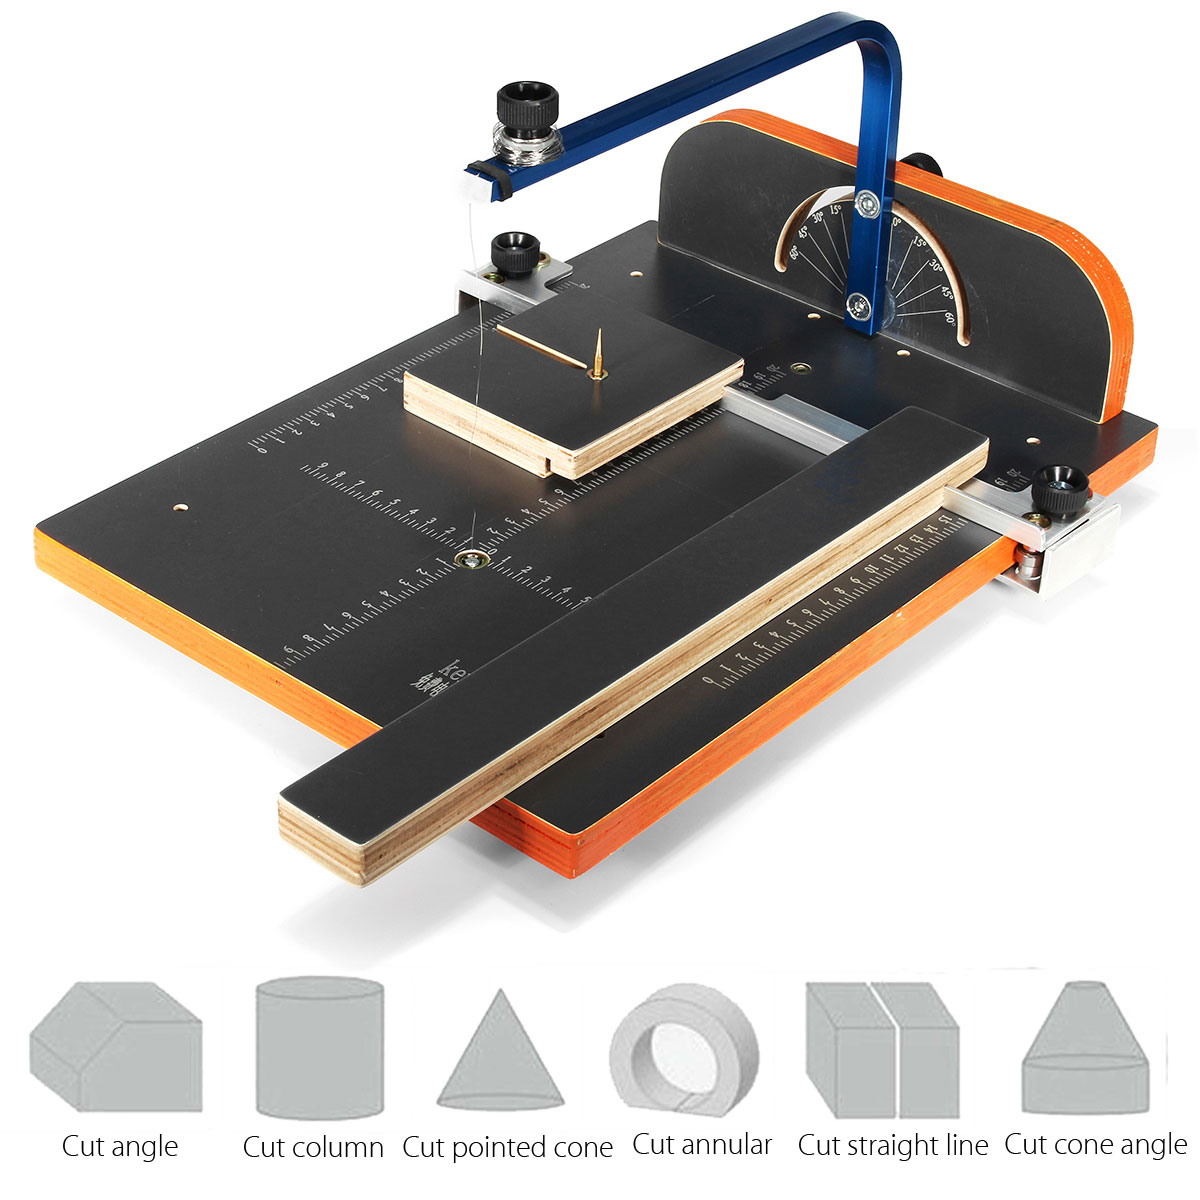 KD 6 220 ボルト垂直泡カッター熱線発泡切断機作業スタンドテーブルツール発泡スチロールカッター加熱ツール  グループ上の ホーム&ガーデン からの ダイカットマシン の中 1